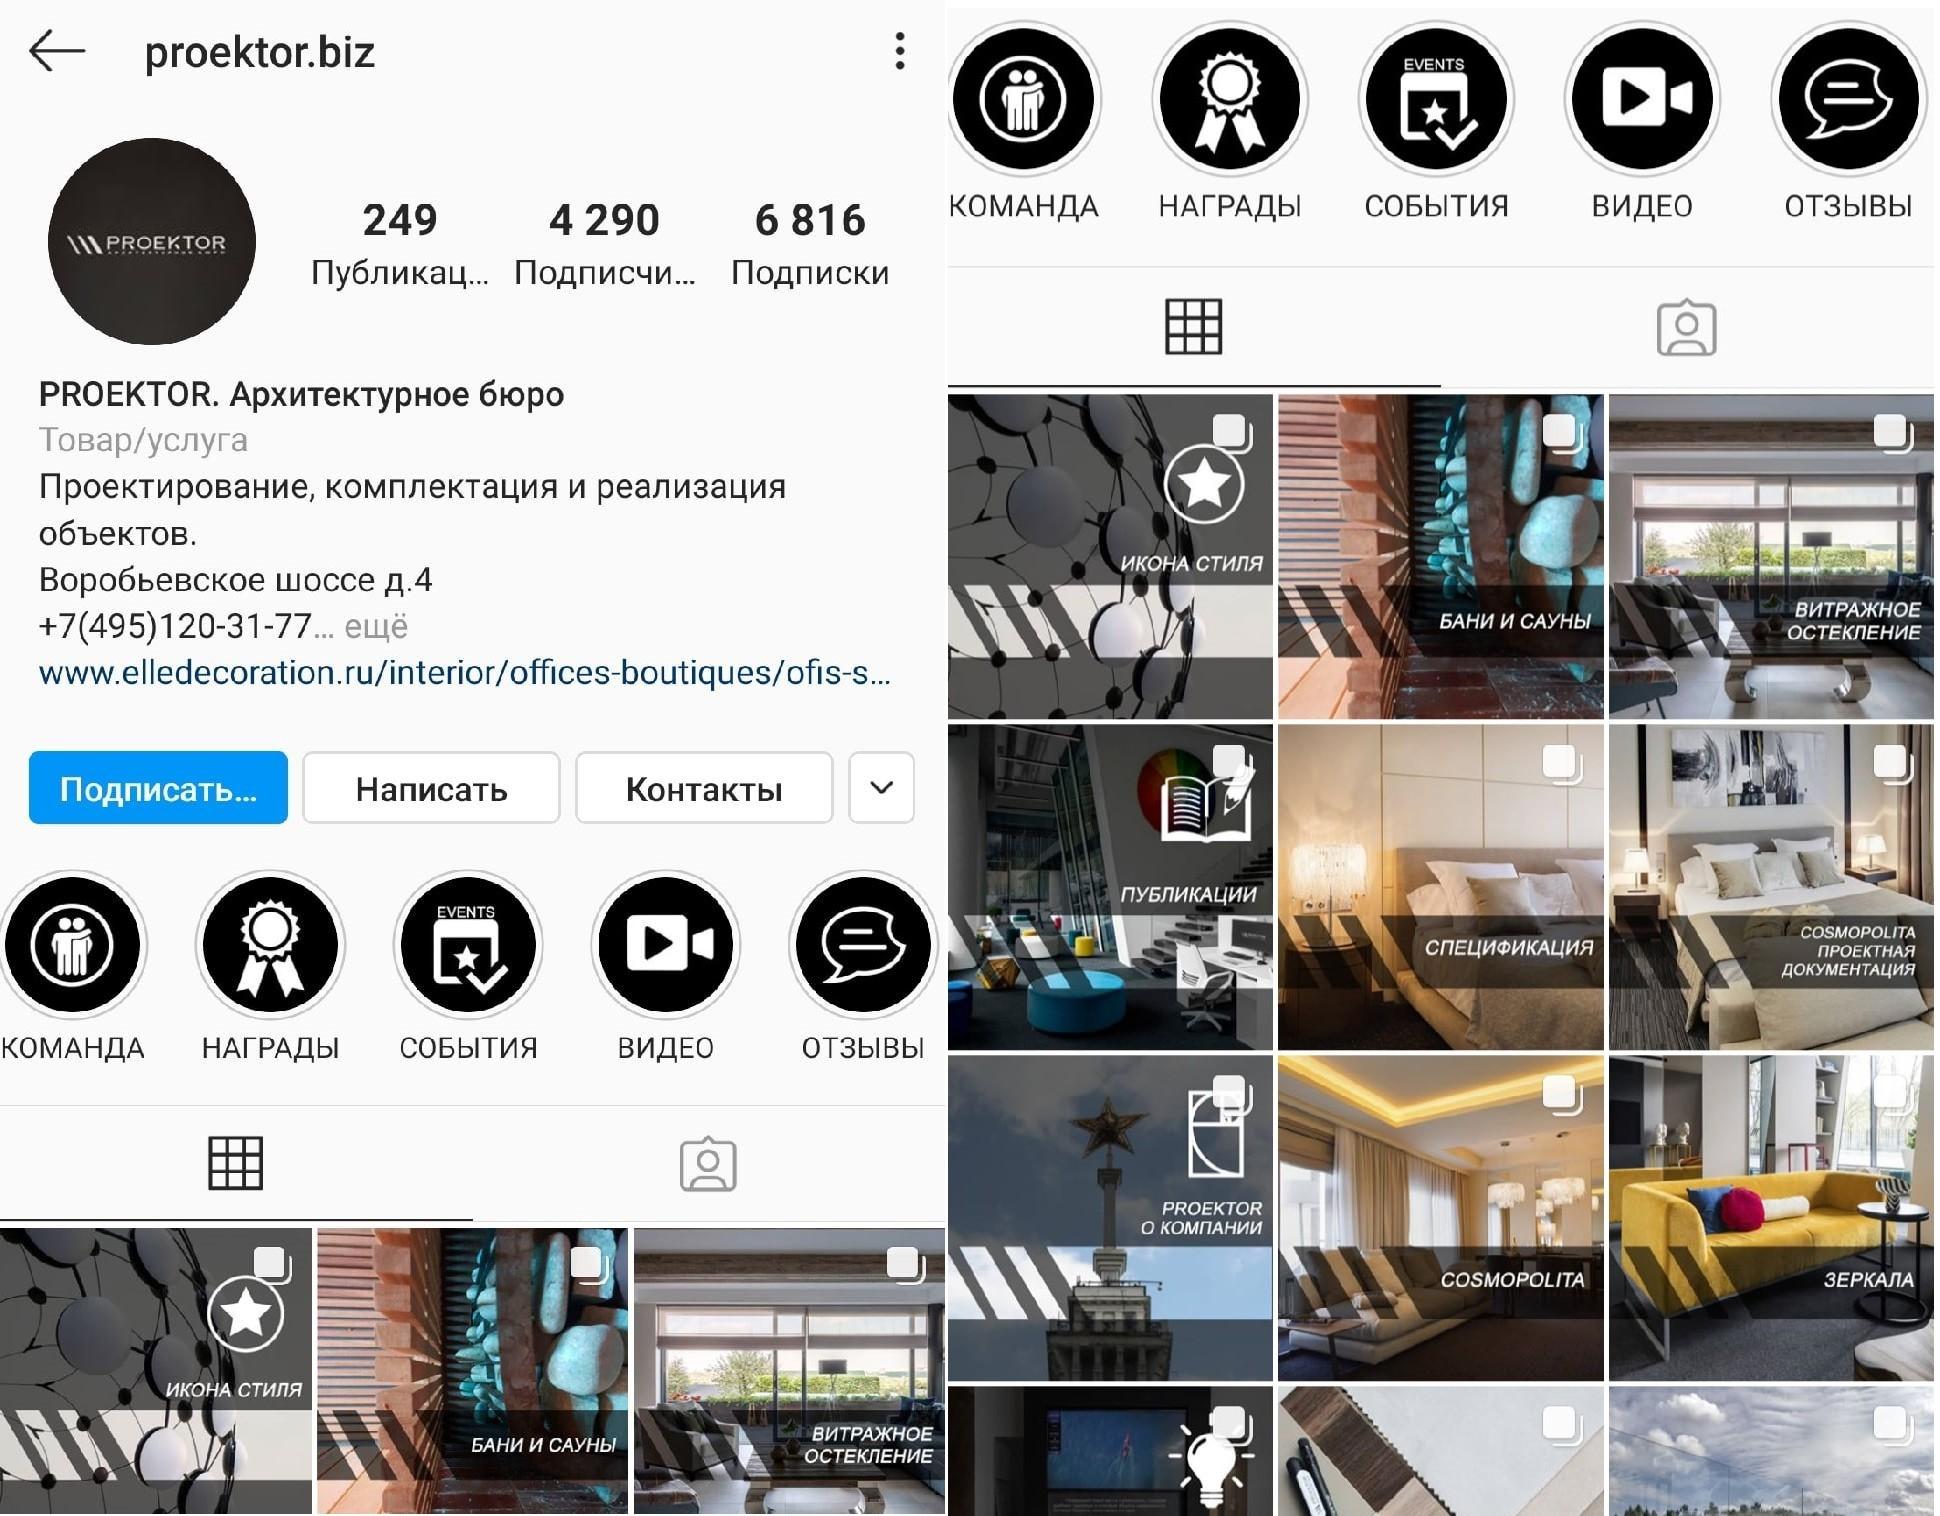 Аккаунт в Instagram Proektor